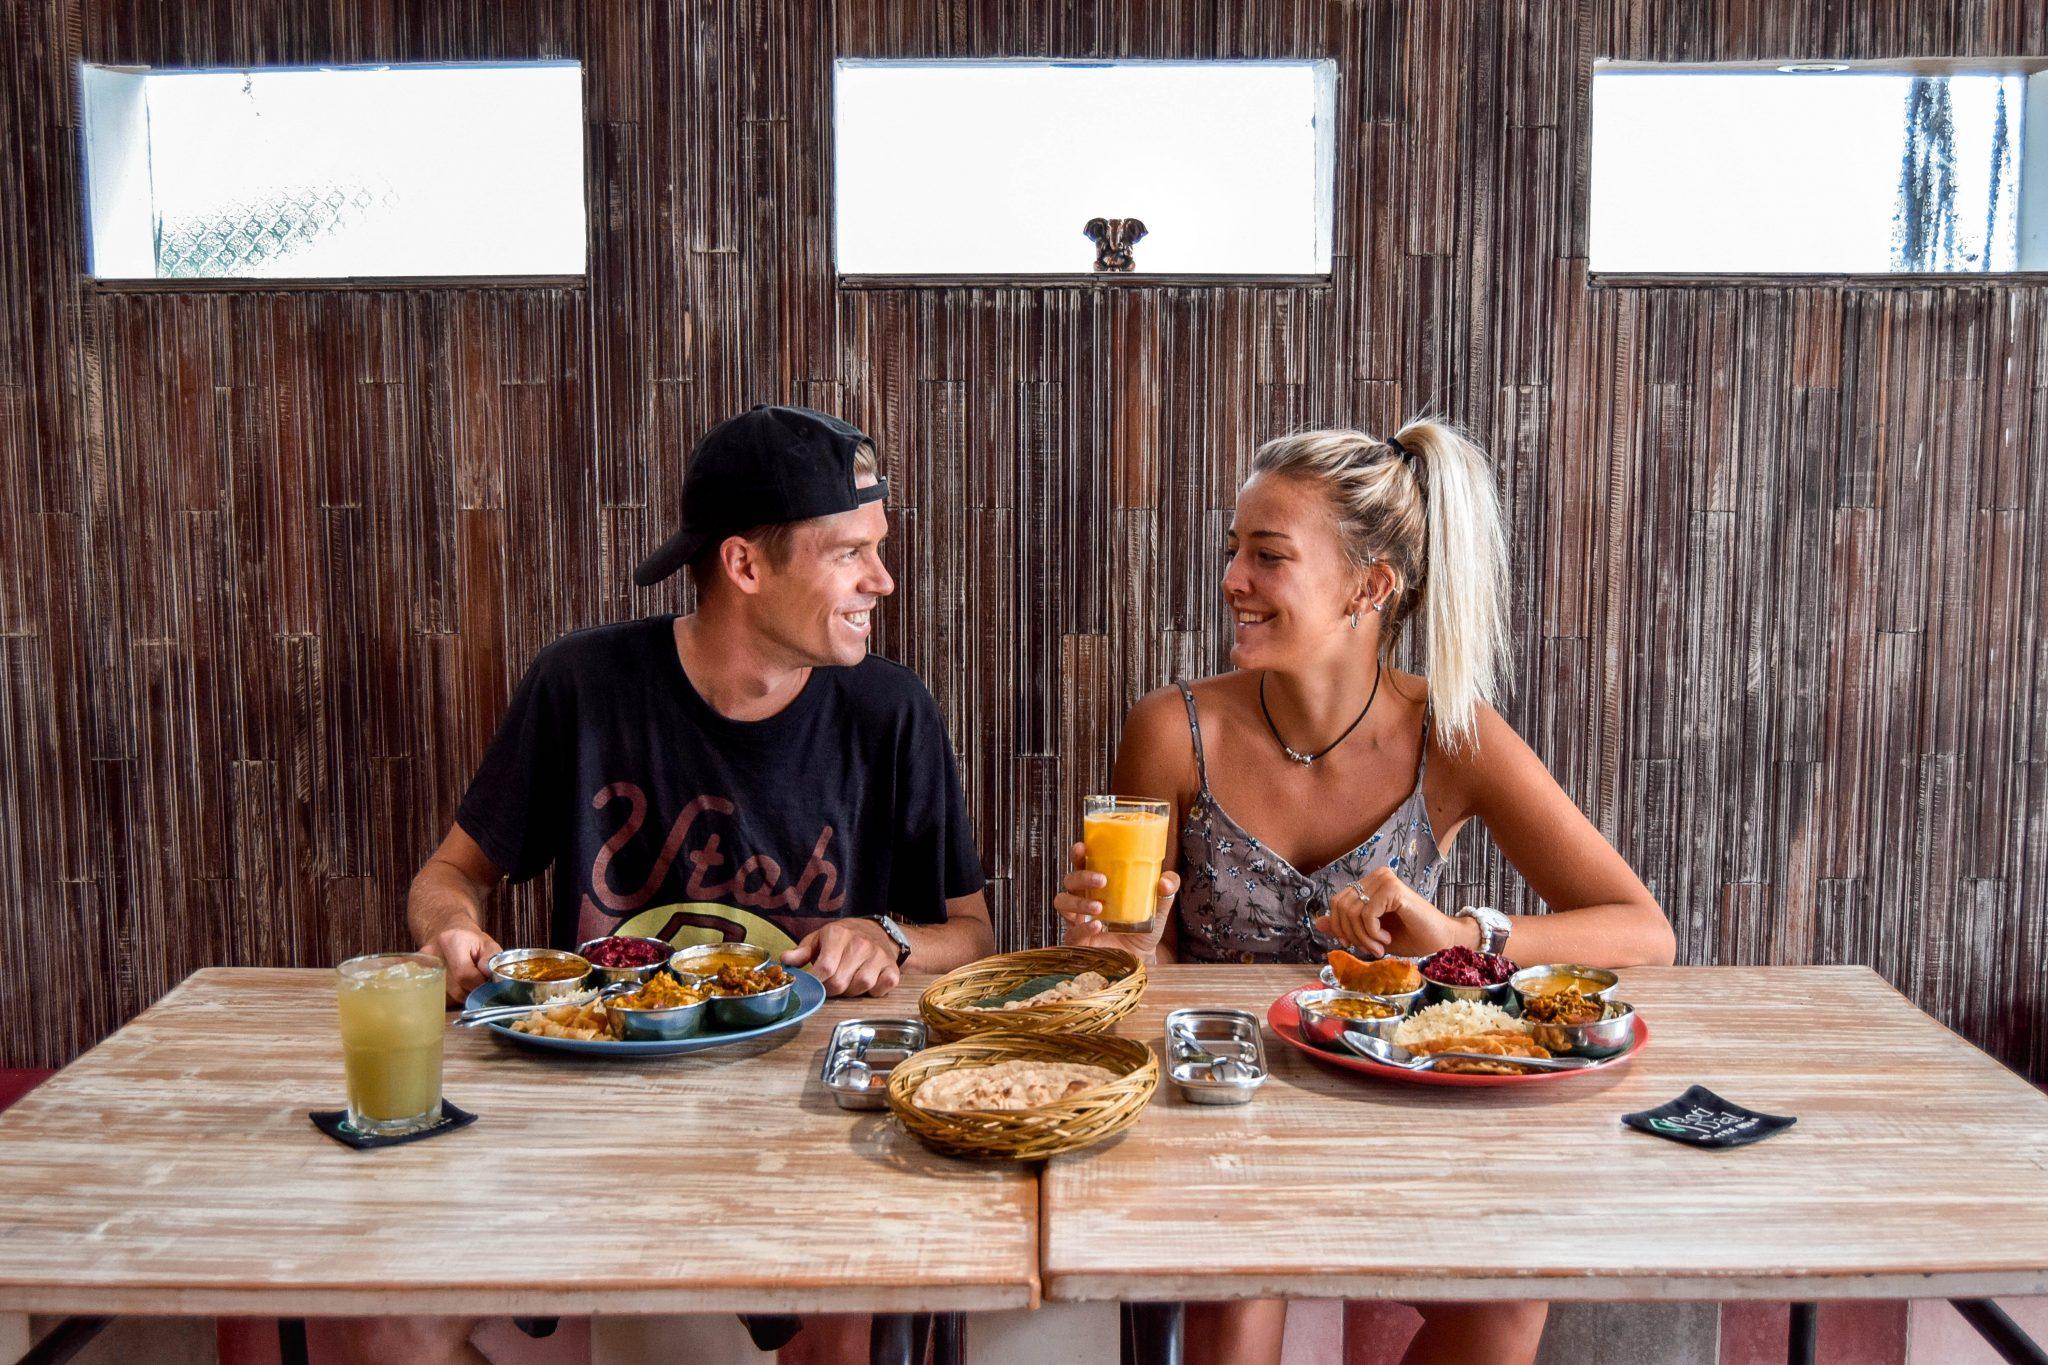 Wanderers & Warriors - Charlie & Lauren UK Travel Couple - Roti Daal Asia Berawa Bali Homestyle Indian - Best Restaurants In Bali Restaurants - Best Restaurants In Berawa - Indian Food In Bali